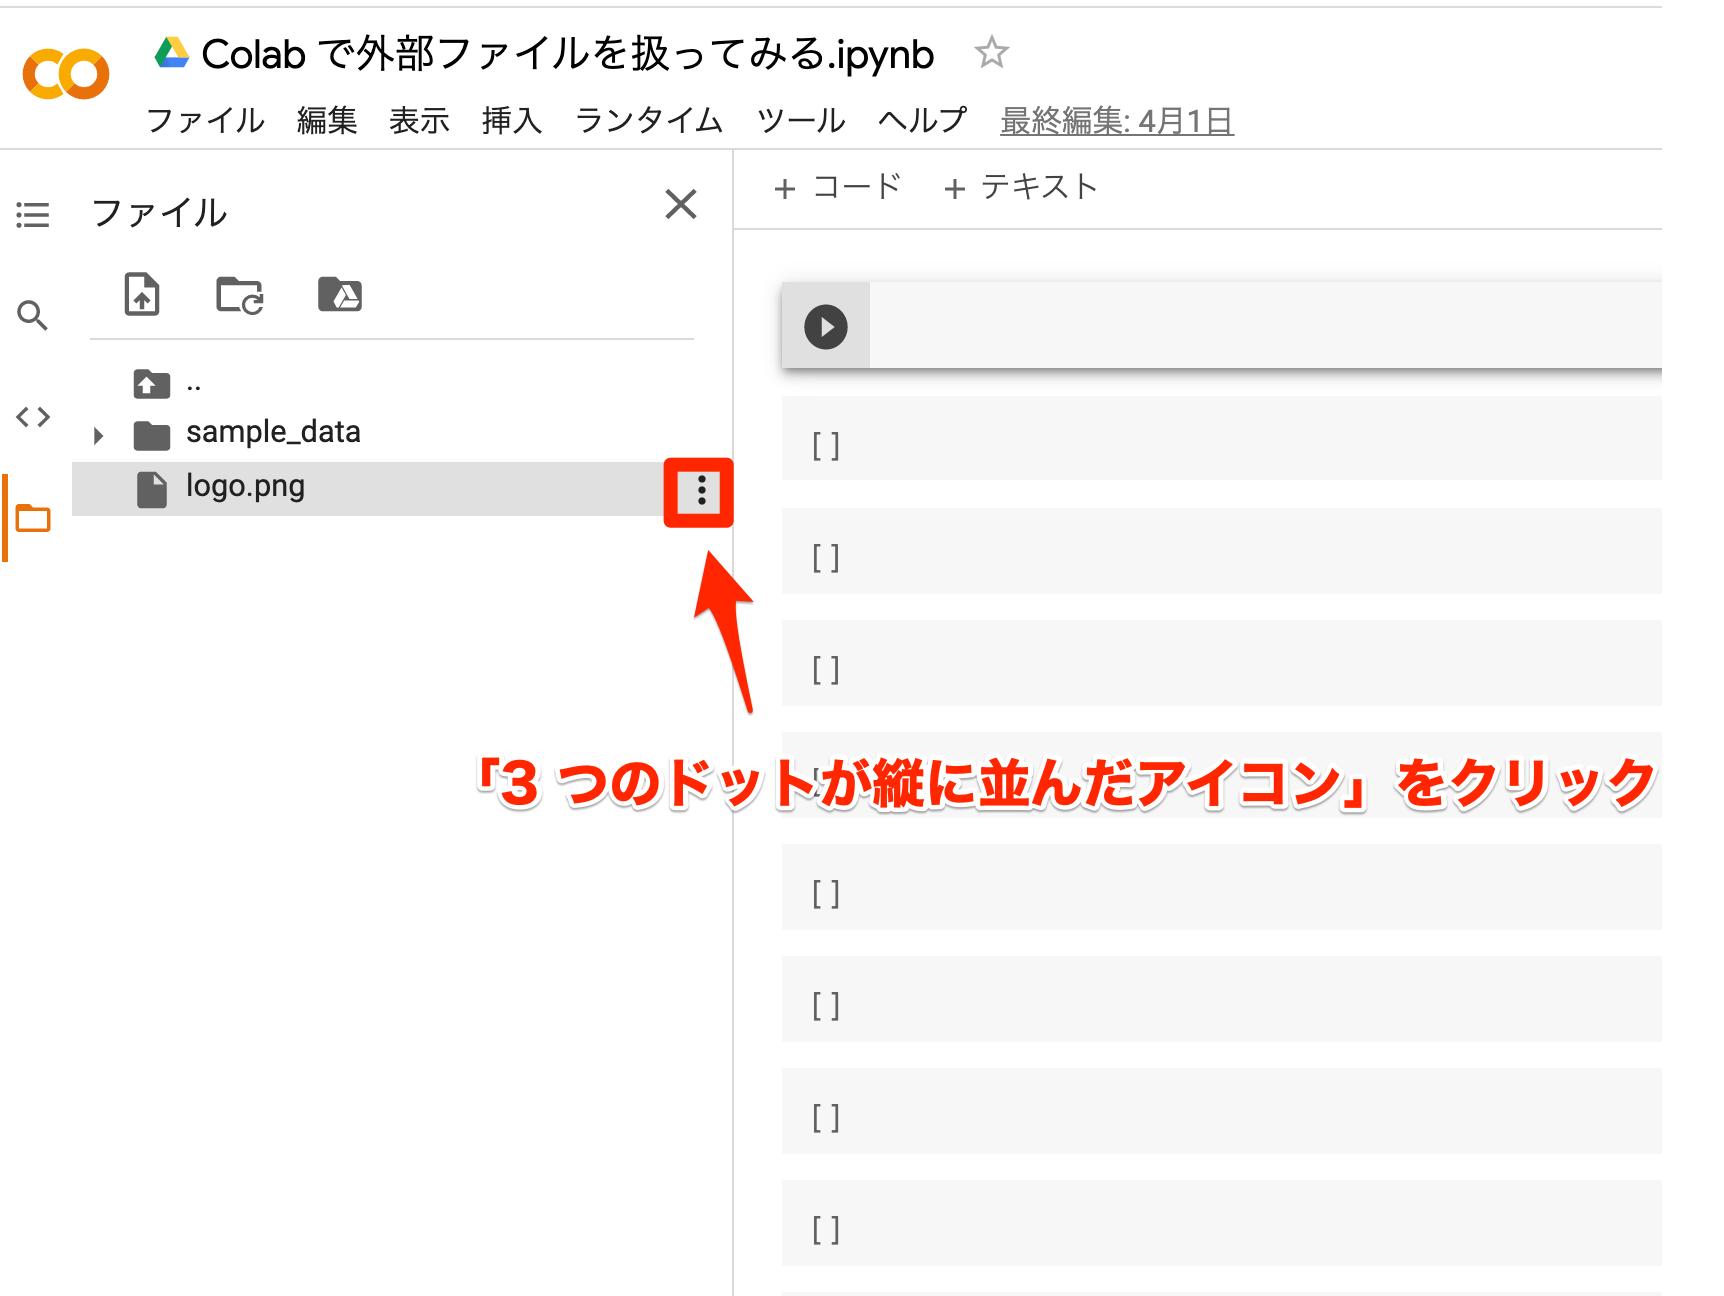 Google Colaboratory sidebar